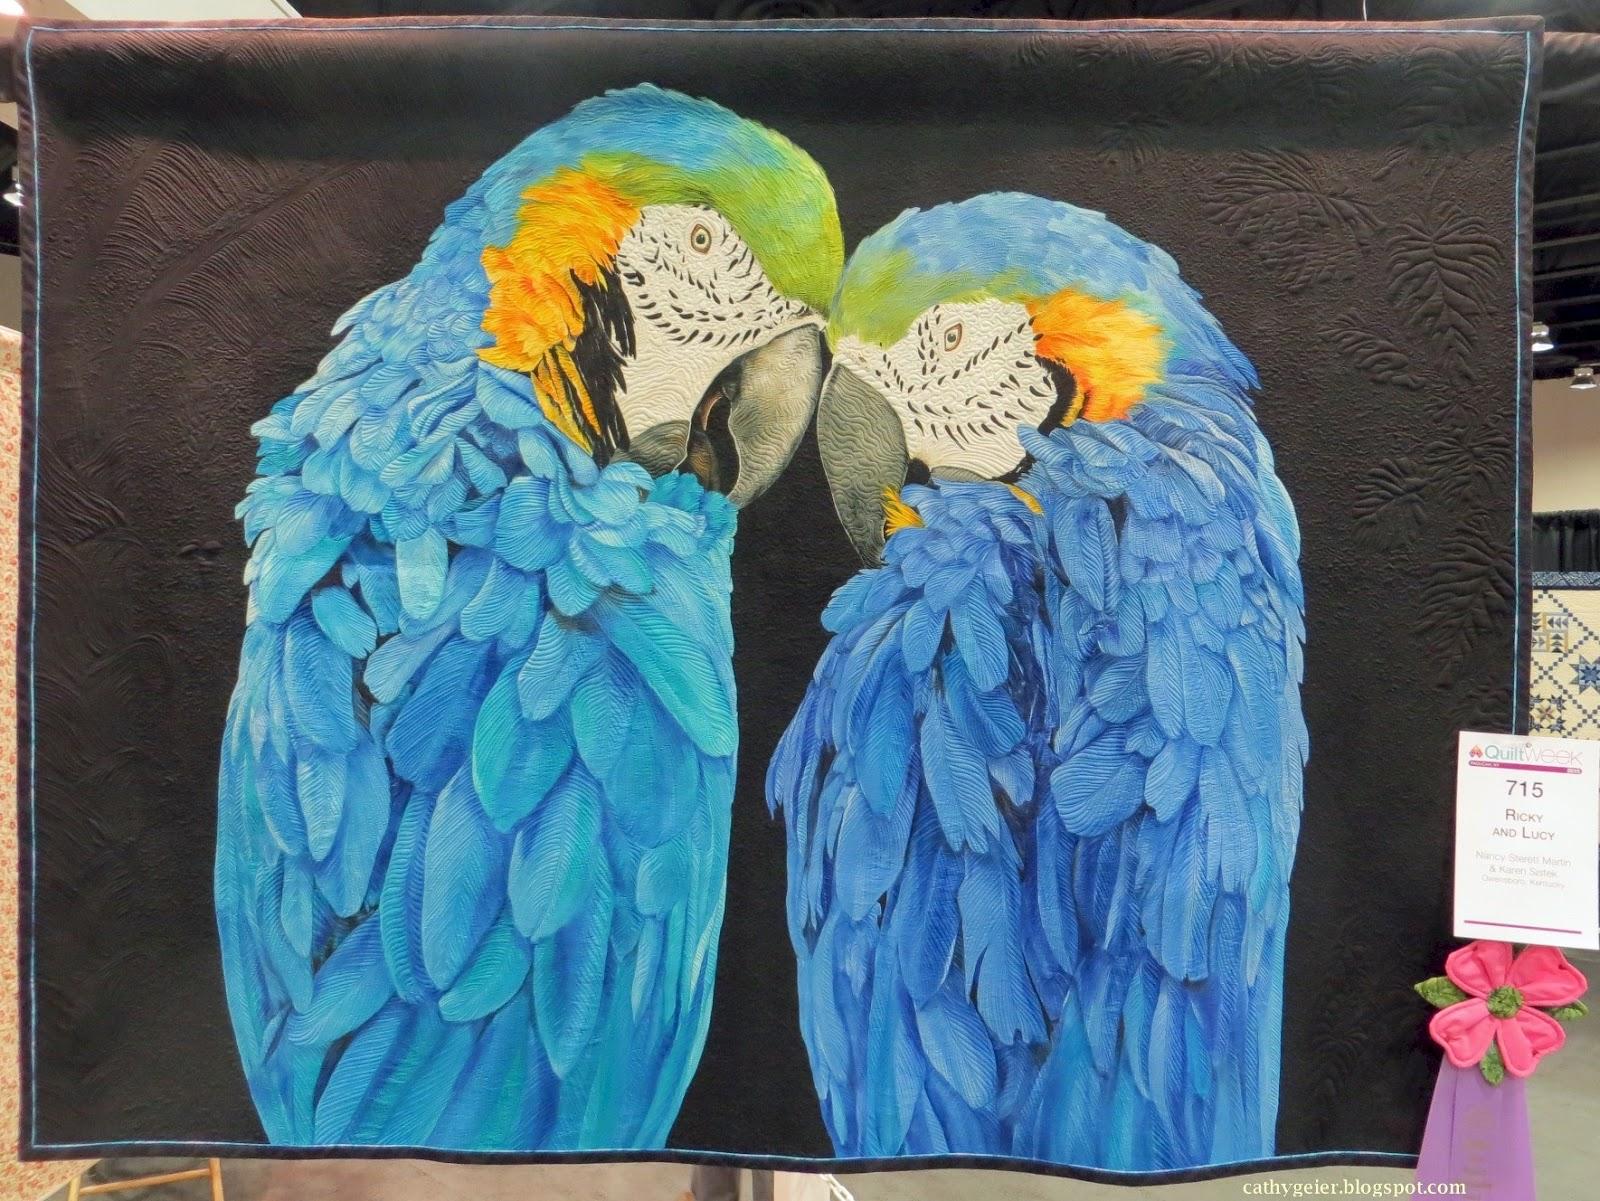 Cathy Geier's Quilty Art Blog: Ribbon Winners - AQS Paducah 2015 ... : aqs quilt show - Adamdwight.com